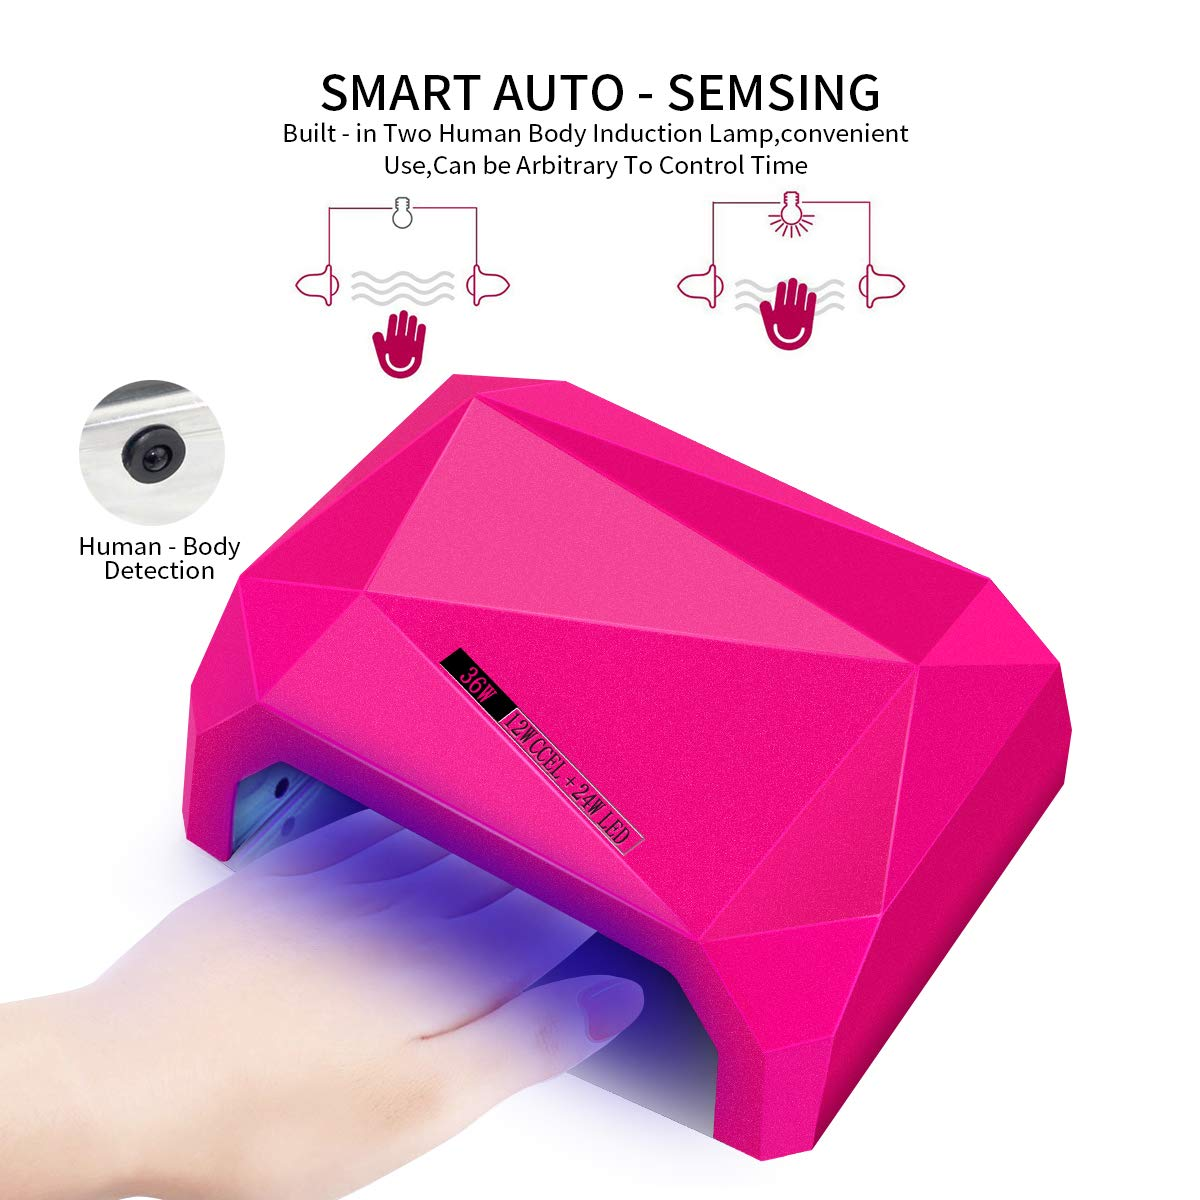 Lámpara LED UV Profesional de 36W, Morpilot Secador de Uñas para Manicura de Shellac y Gel con Temporizador de 3 Modos para mujer